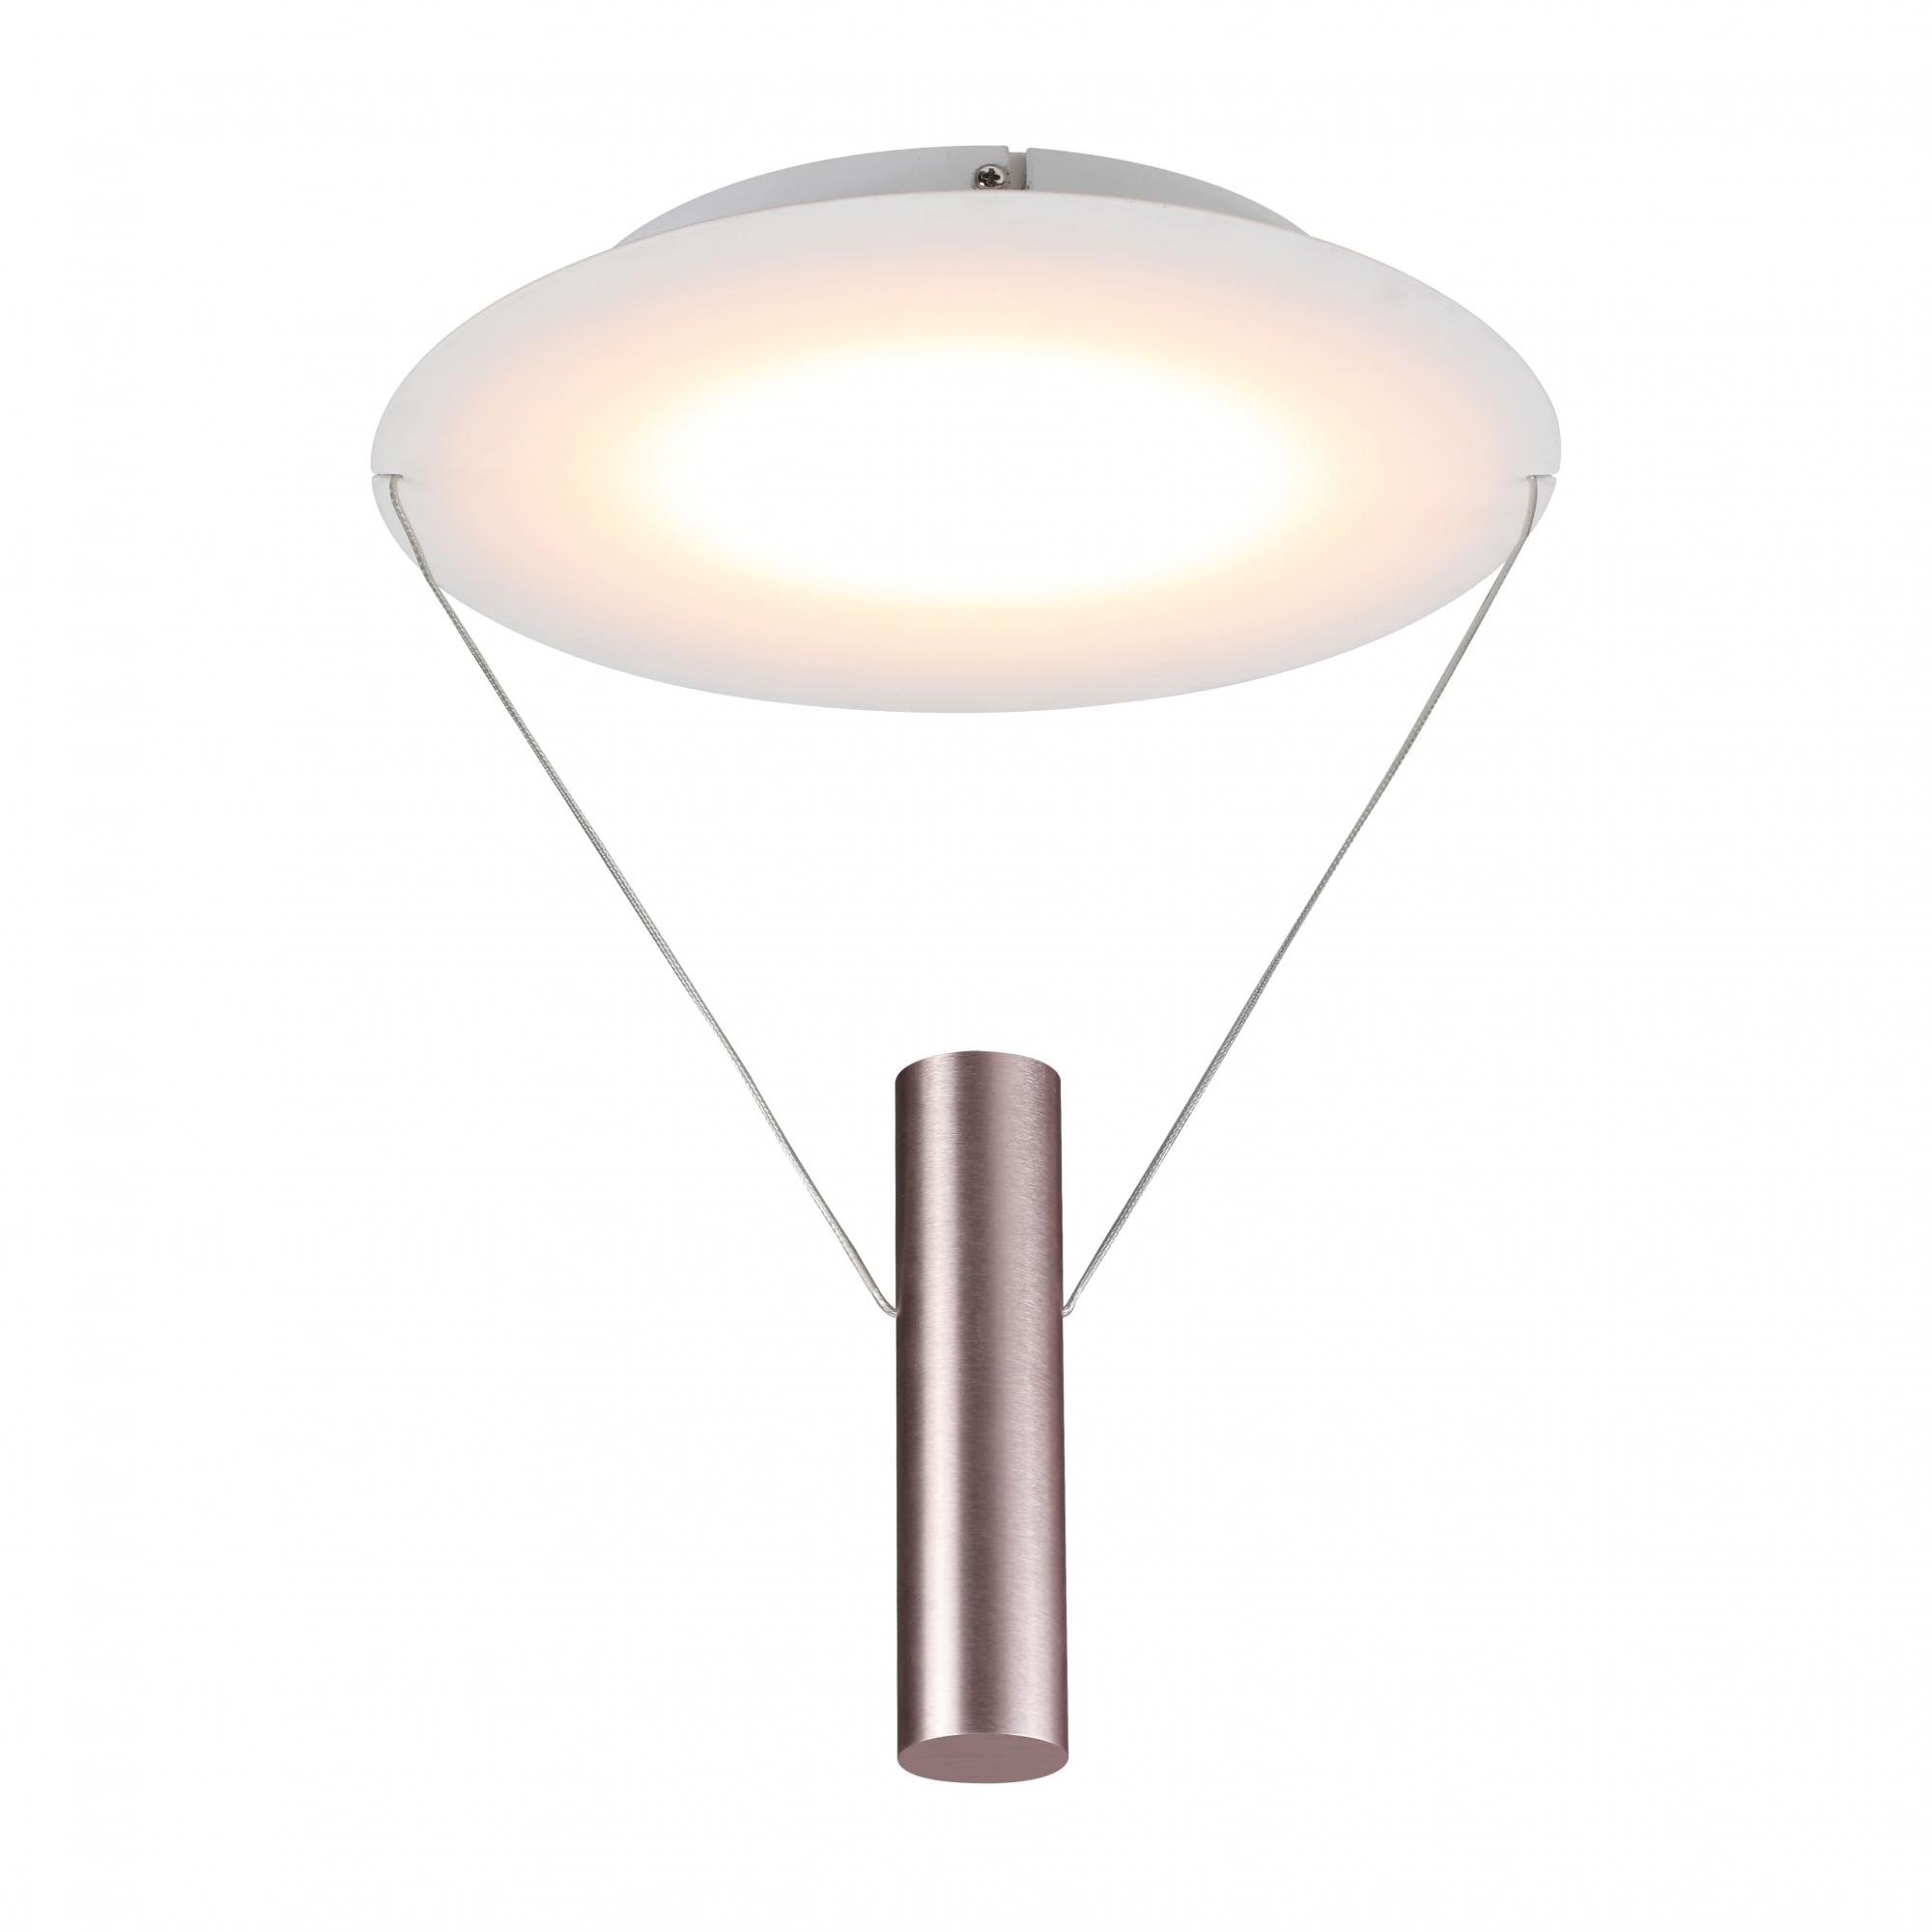 Plafon Tino Pale Gold 30x60cm Led 12W Bivolt Bella Iluminação CD007